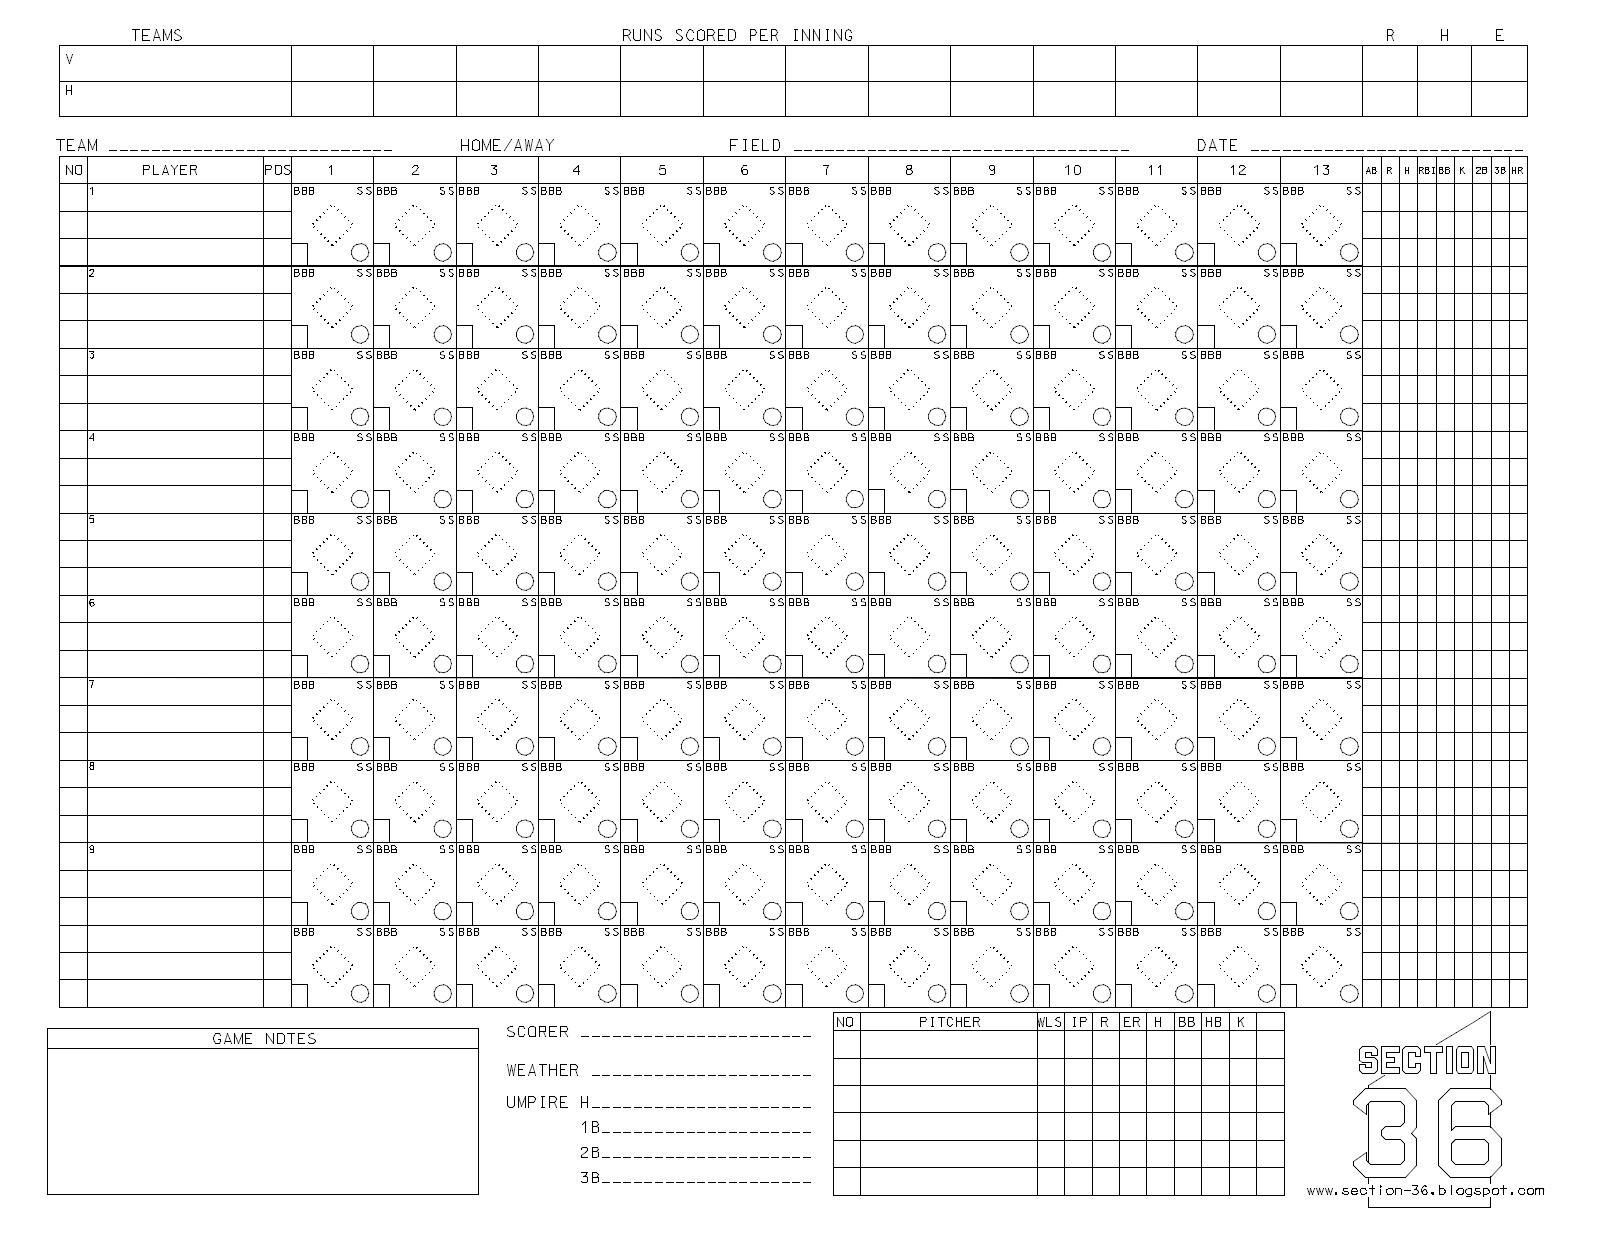 baseball box score template - baseball score sheets print pictures to pin on pinterest